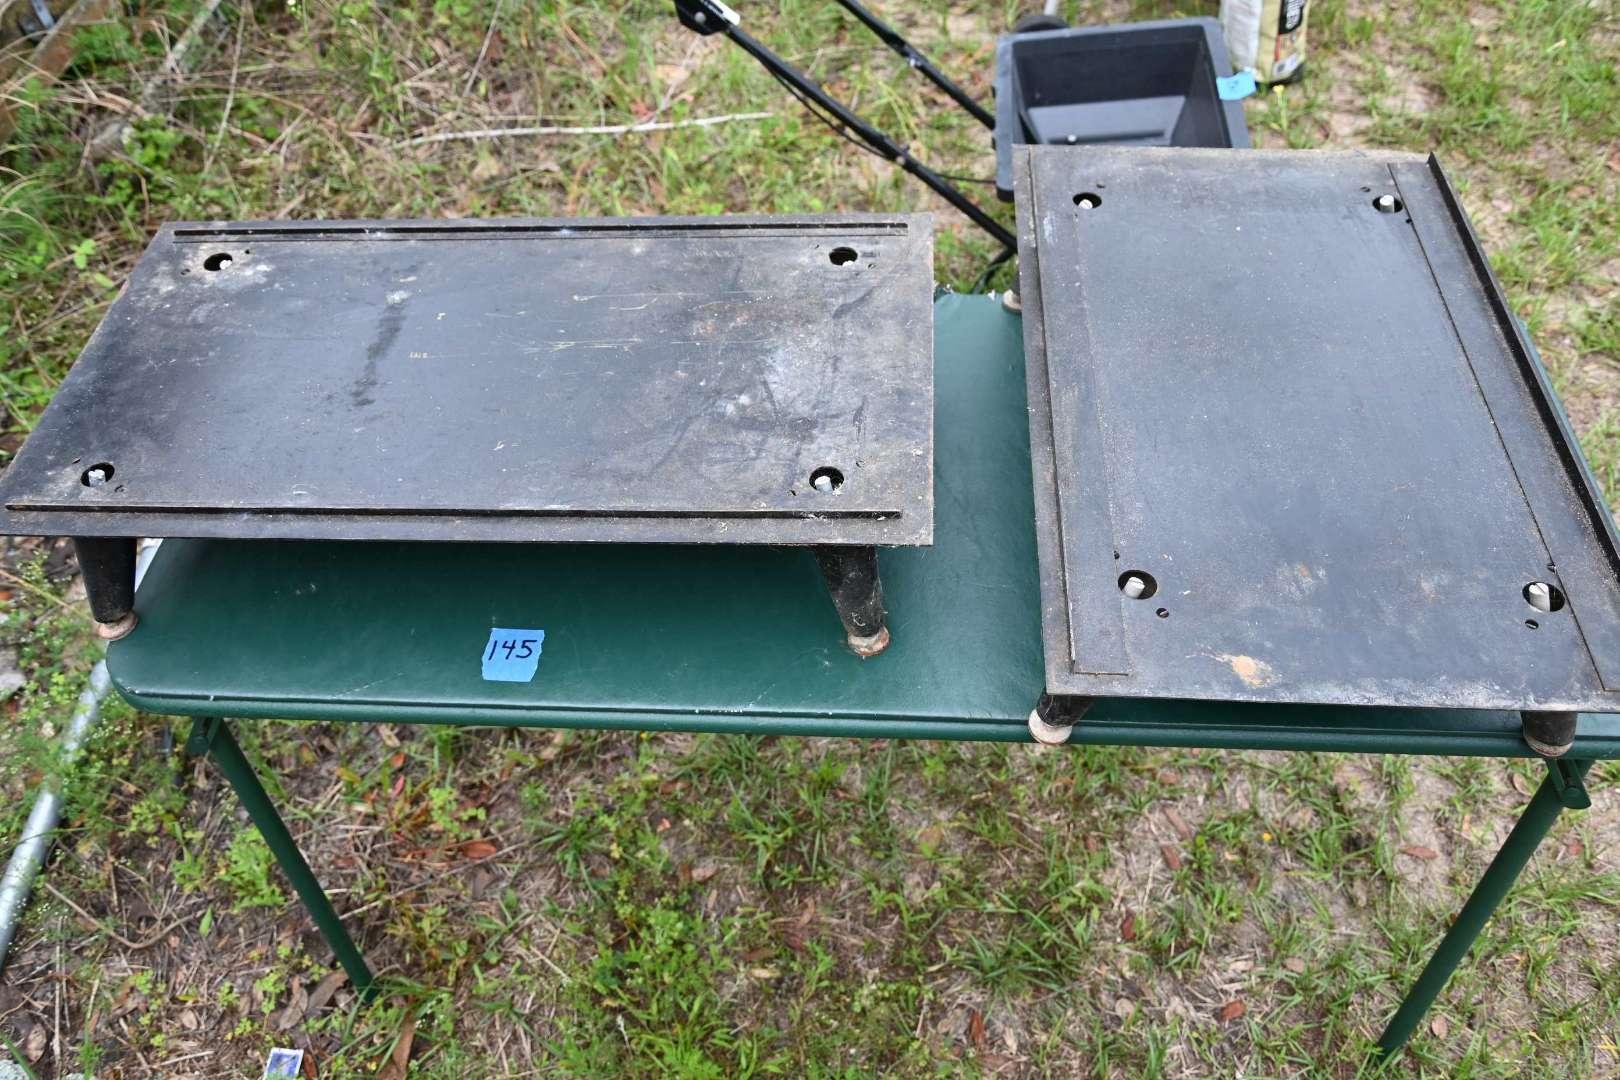 Lot # 145 Heavy metal adjustable leveling legs bases